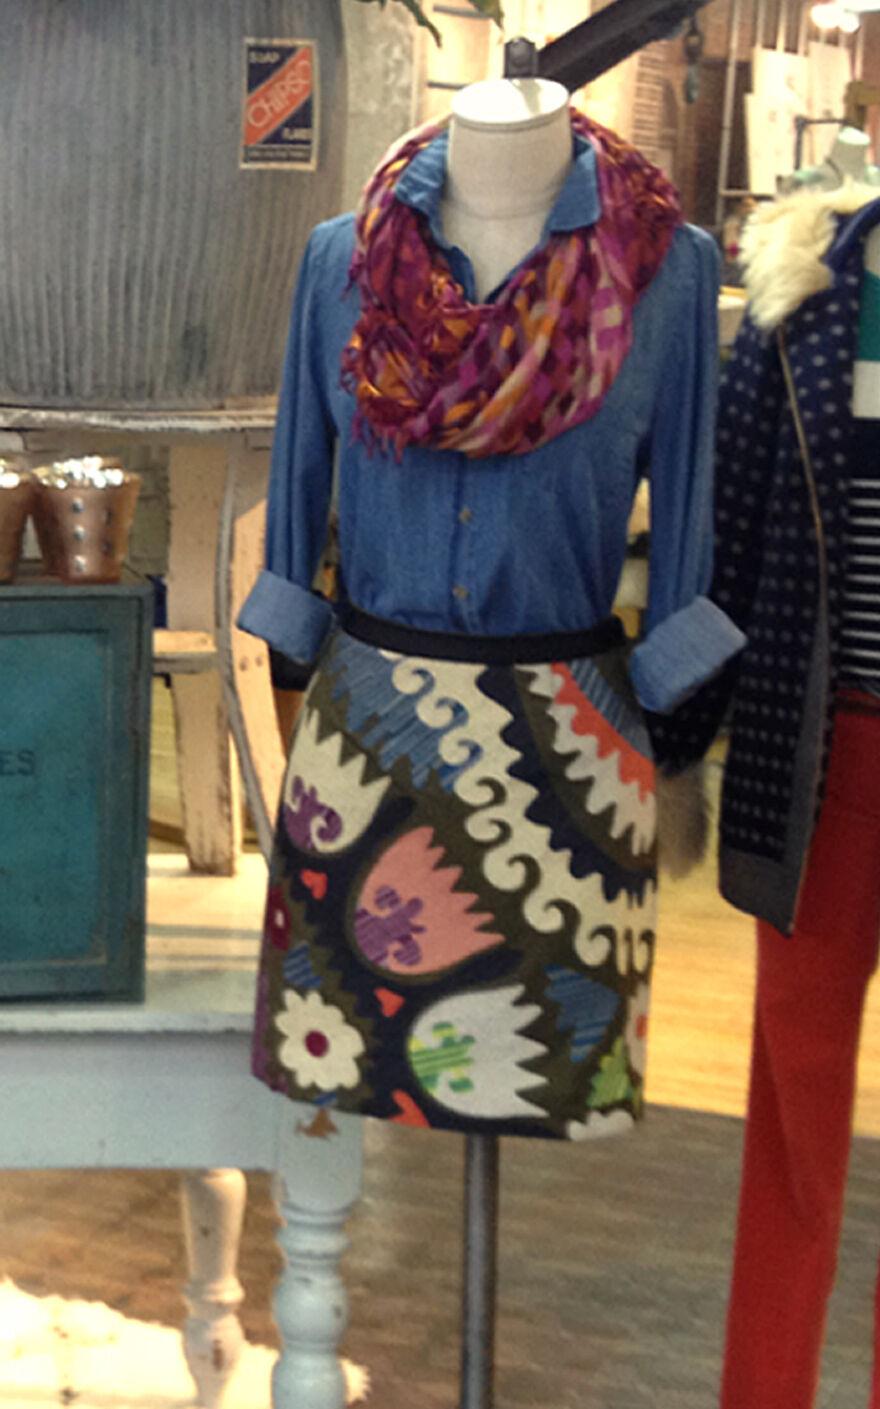 NWT Sz 4 Anthropologie Tulipa Embroidered Skirt by Vanessa Virginia 5 Rev LAST1